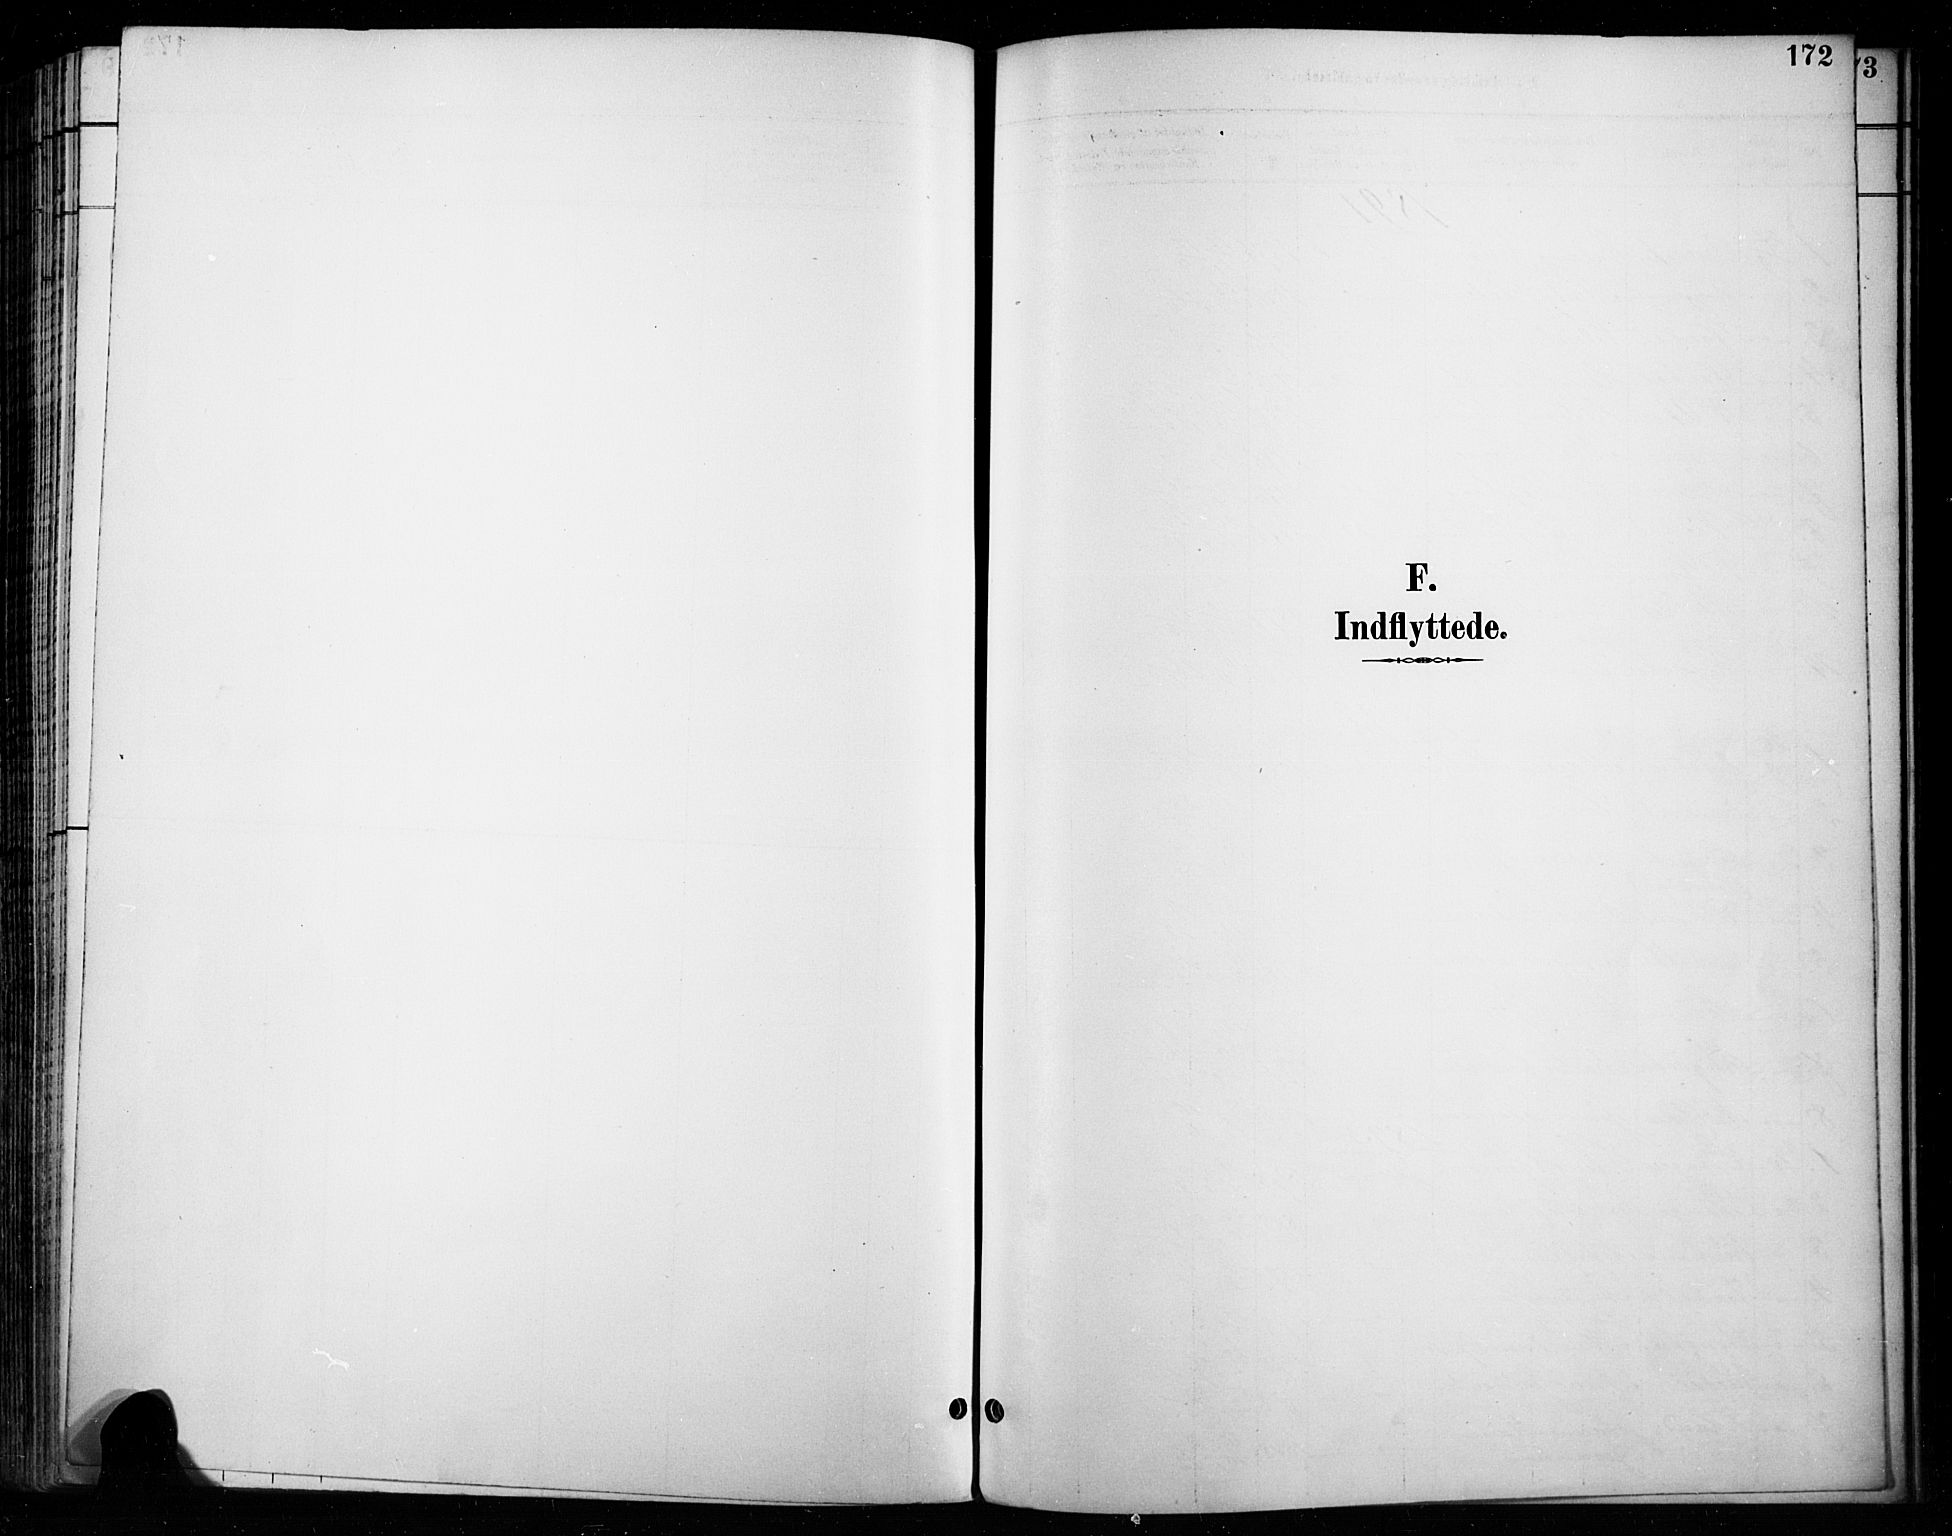 SAH, Vardal prestekontor, H/Ha/Haa/L0011: Ministerialbok nr. 11, 1891-1901, s. 172